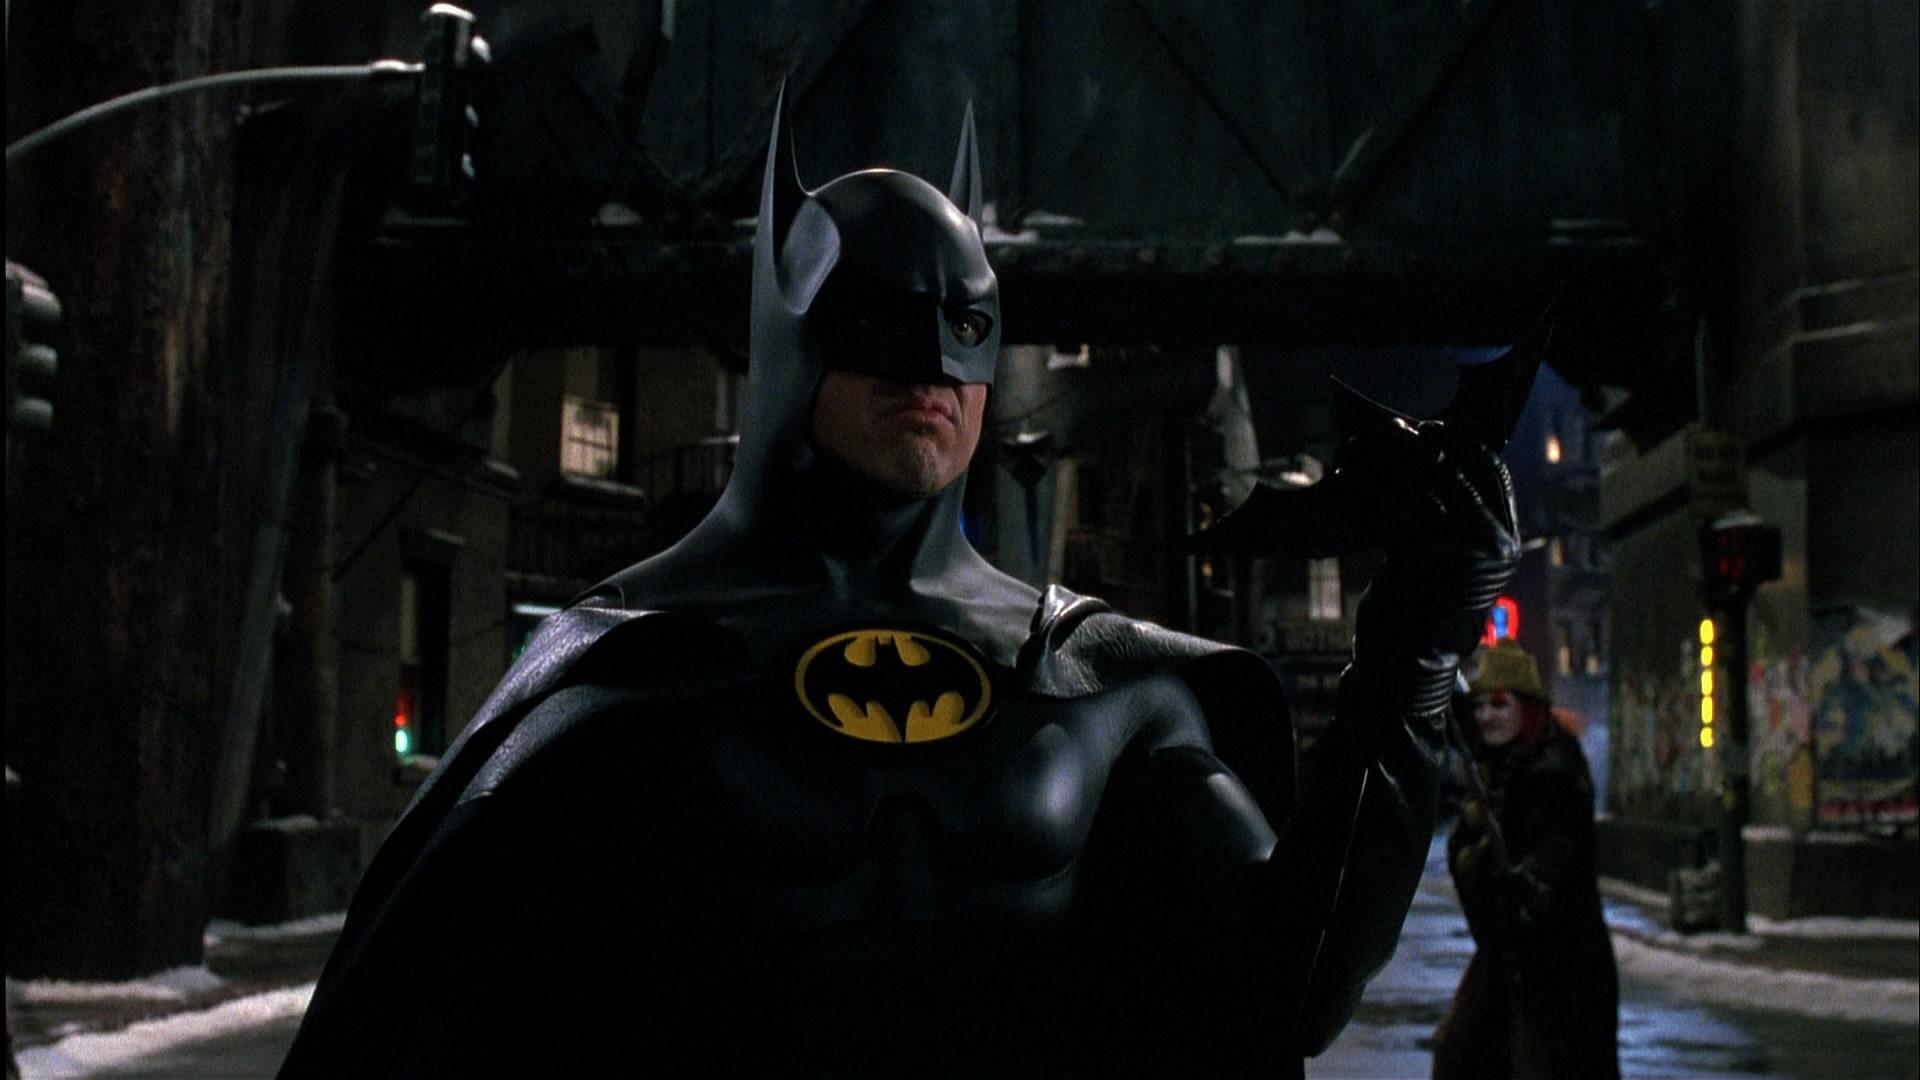 Amazing Batman Returns Pictures & Backgrounds